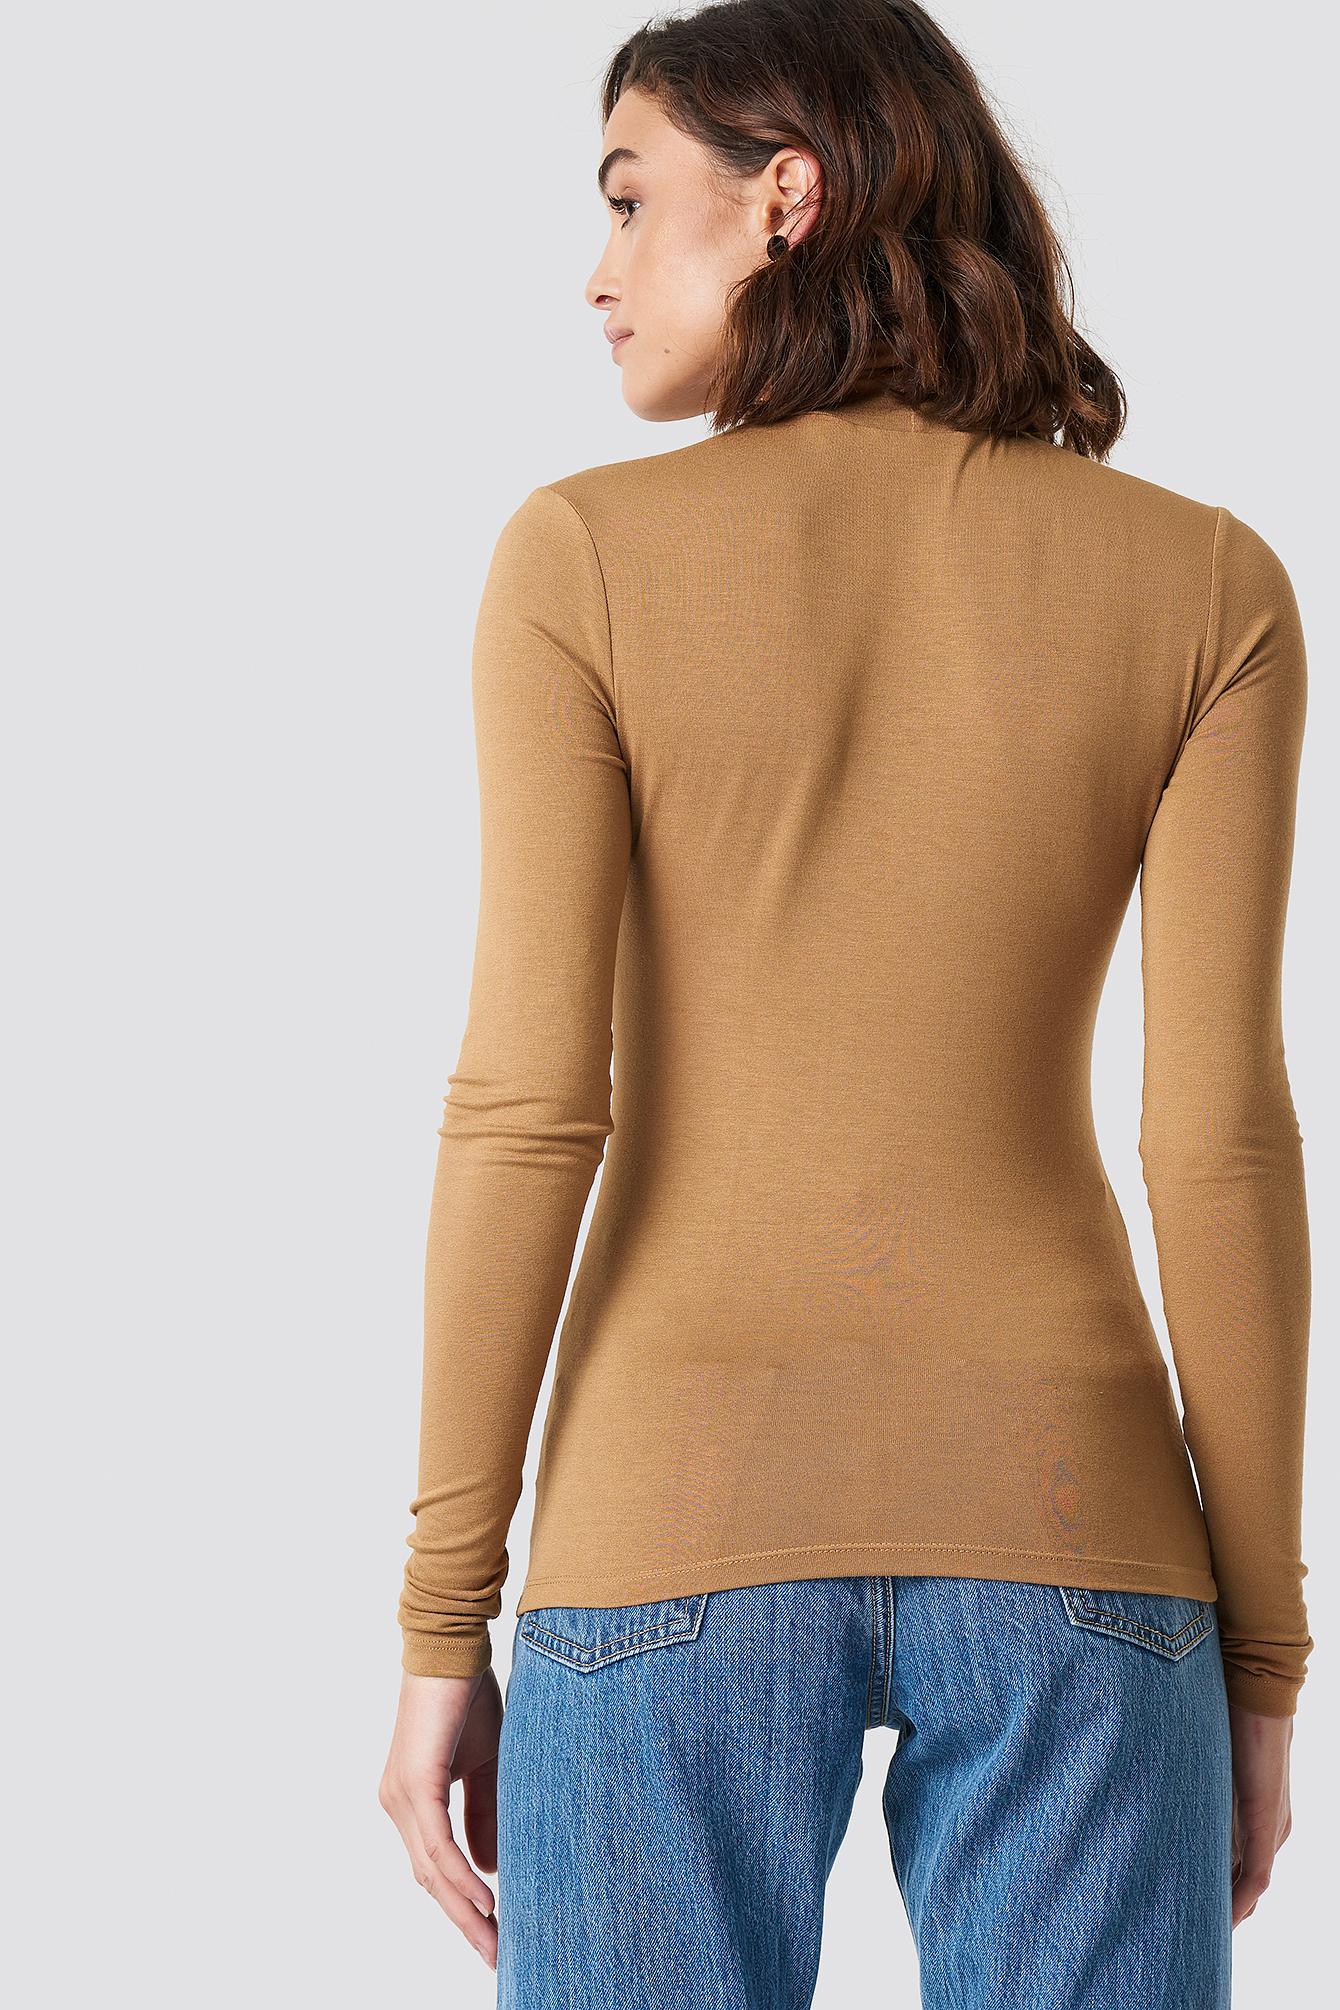 Viscose Long Sleeve Polo Top NA-KD.COM